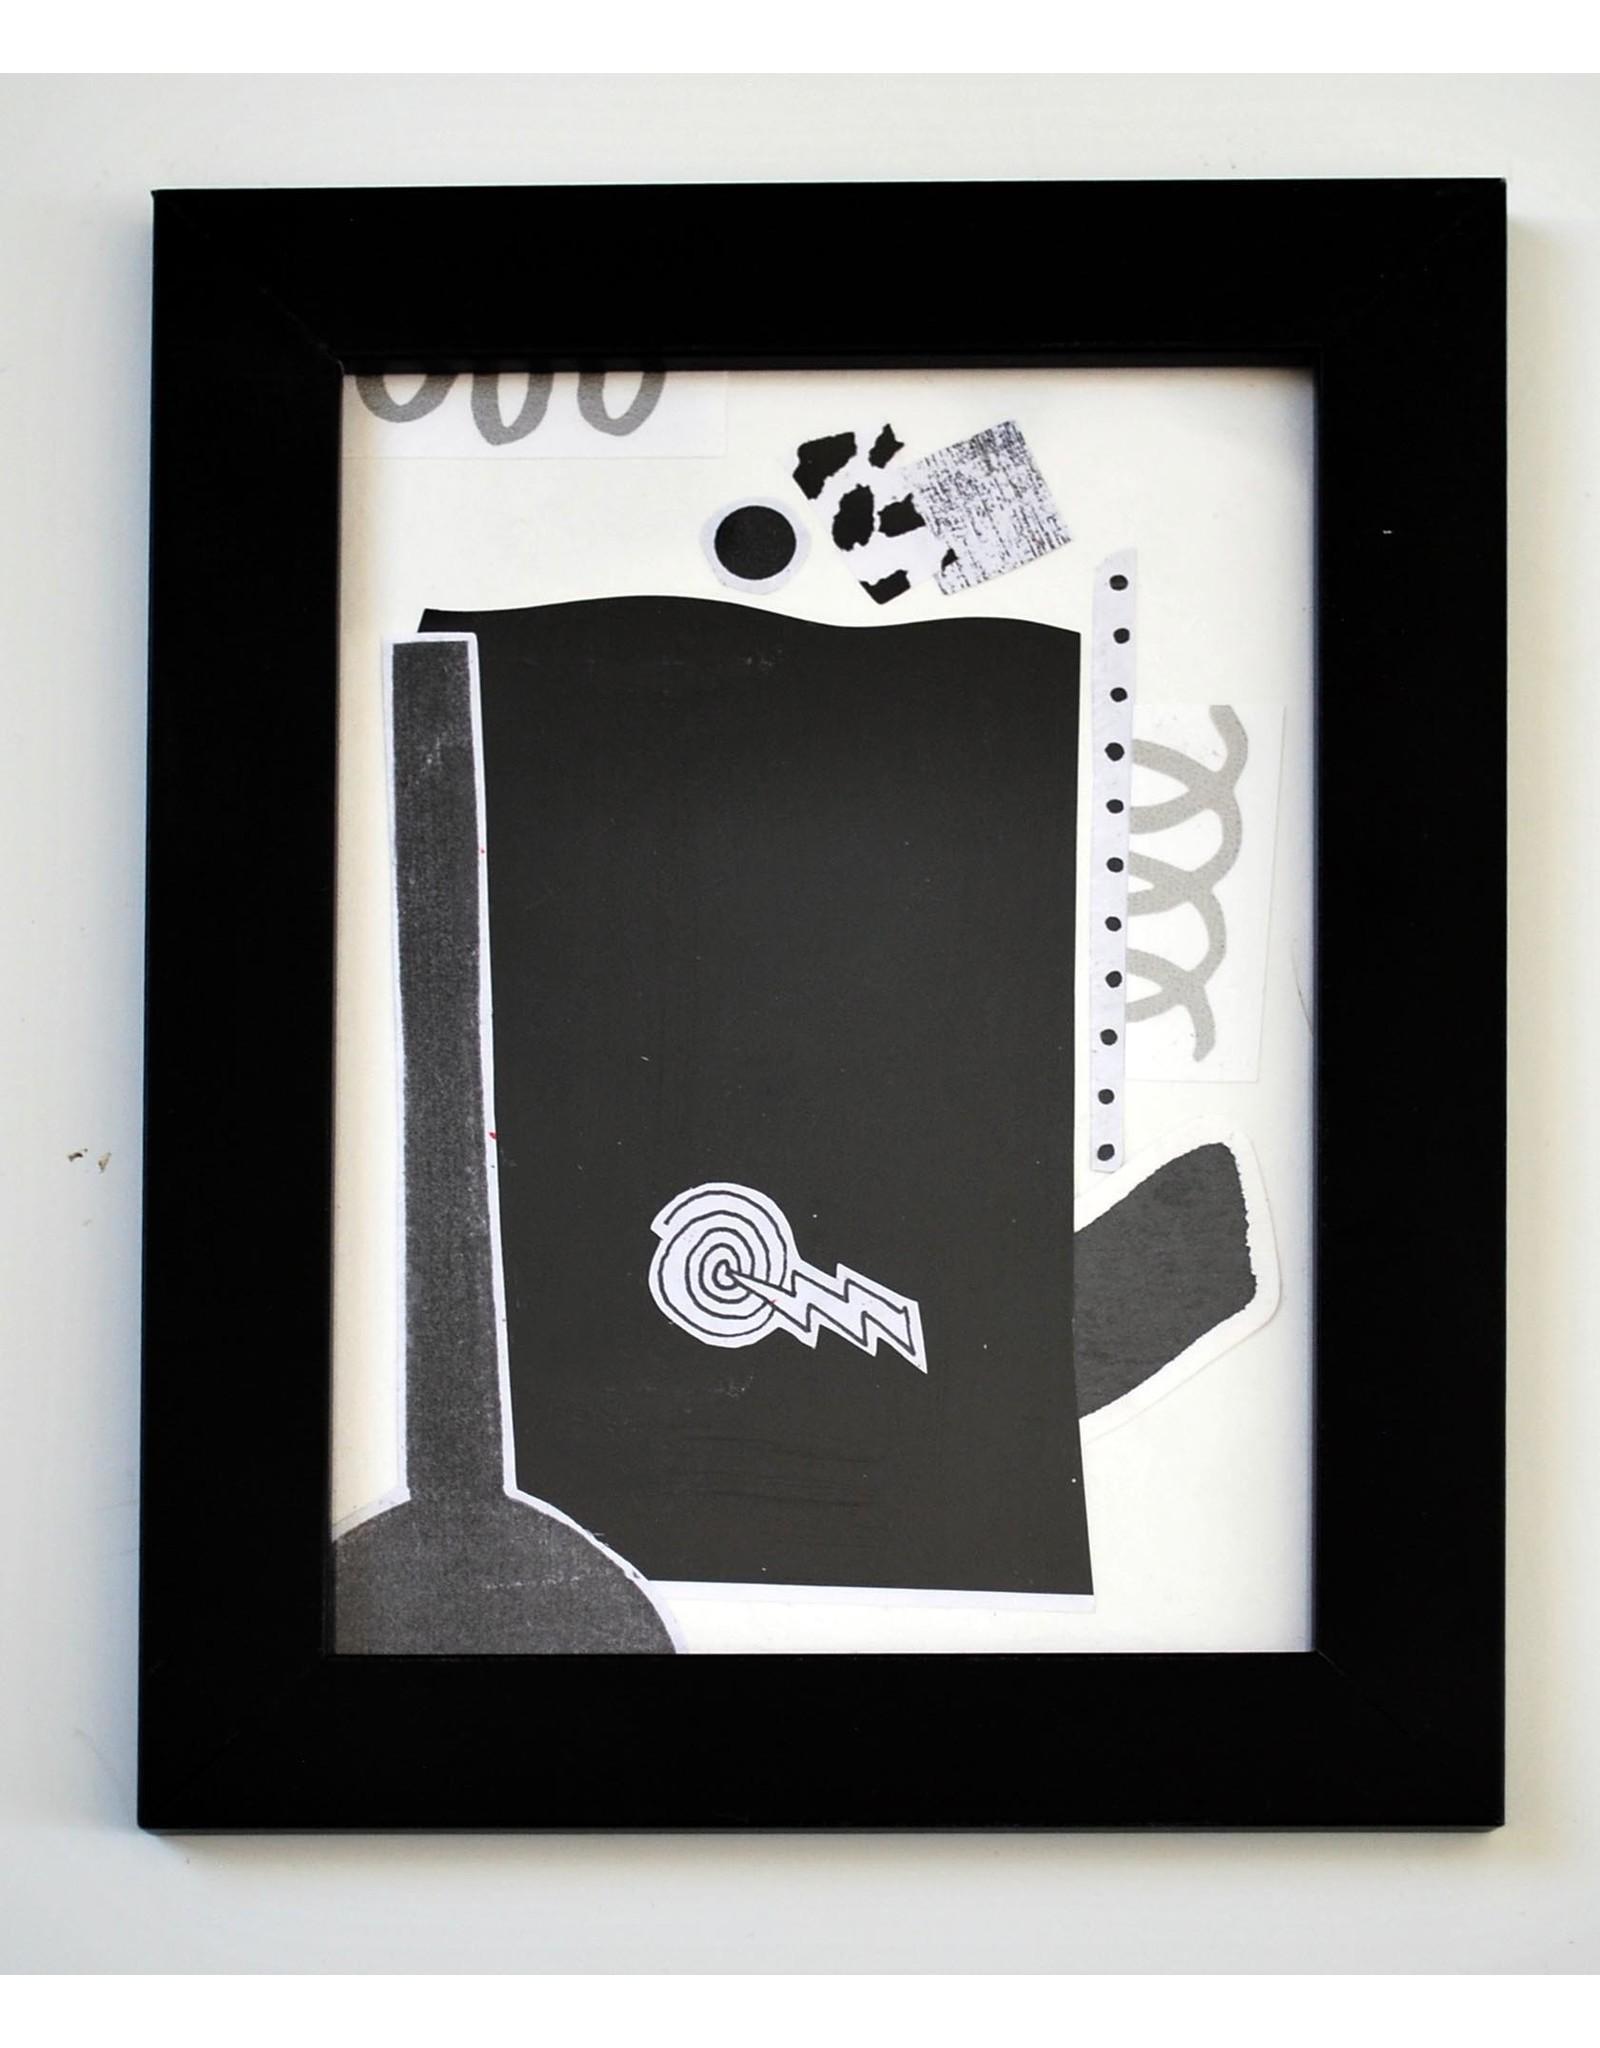 Julia Arredondo Sleep to Dream, framed collage by Julia Arredondo